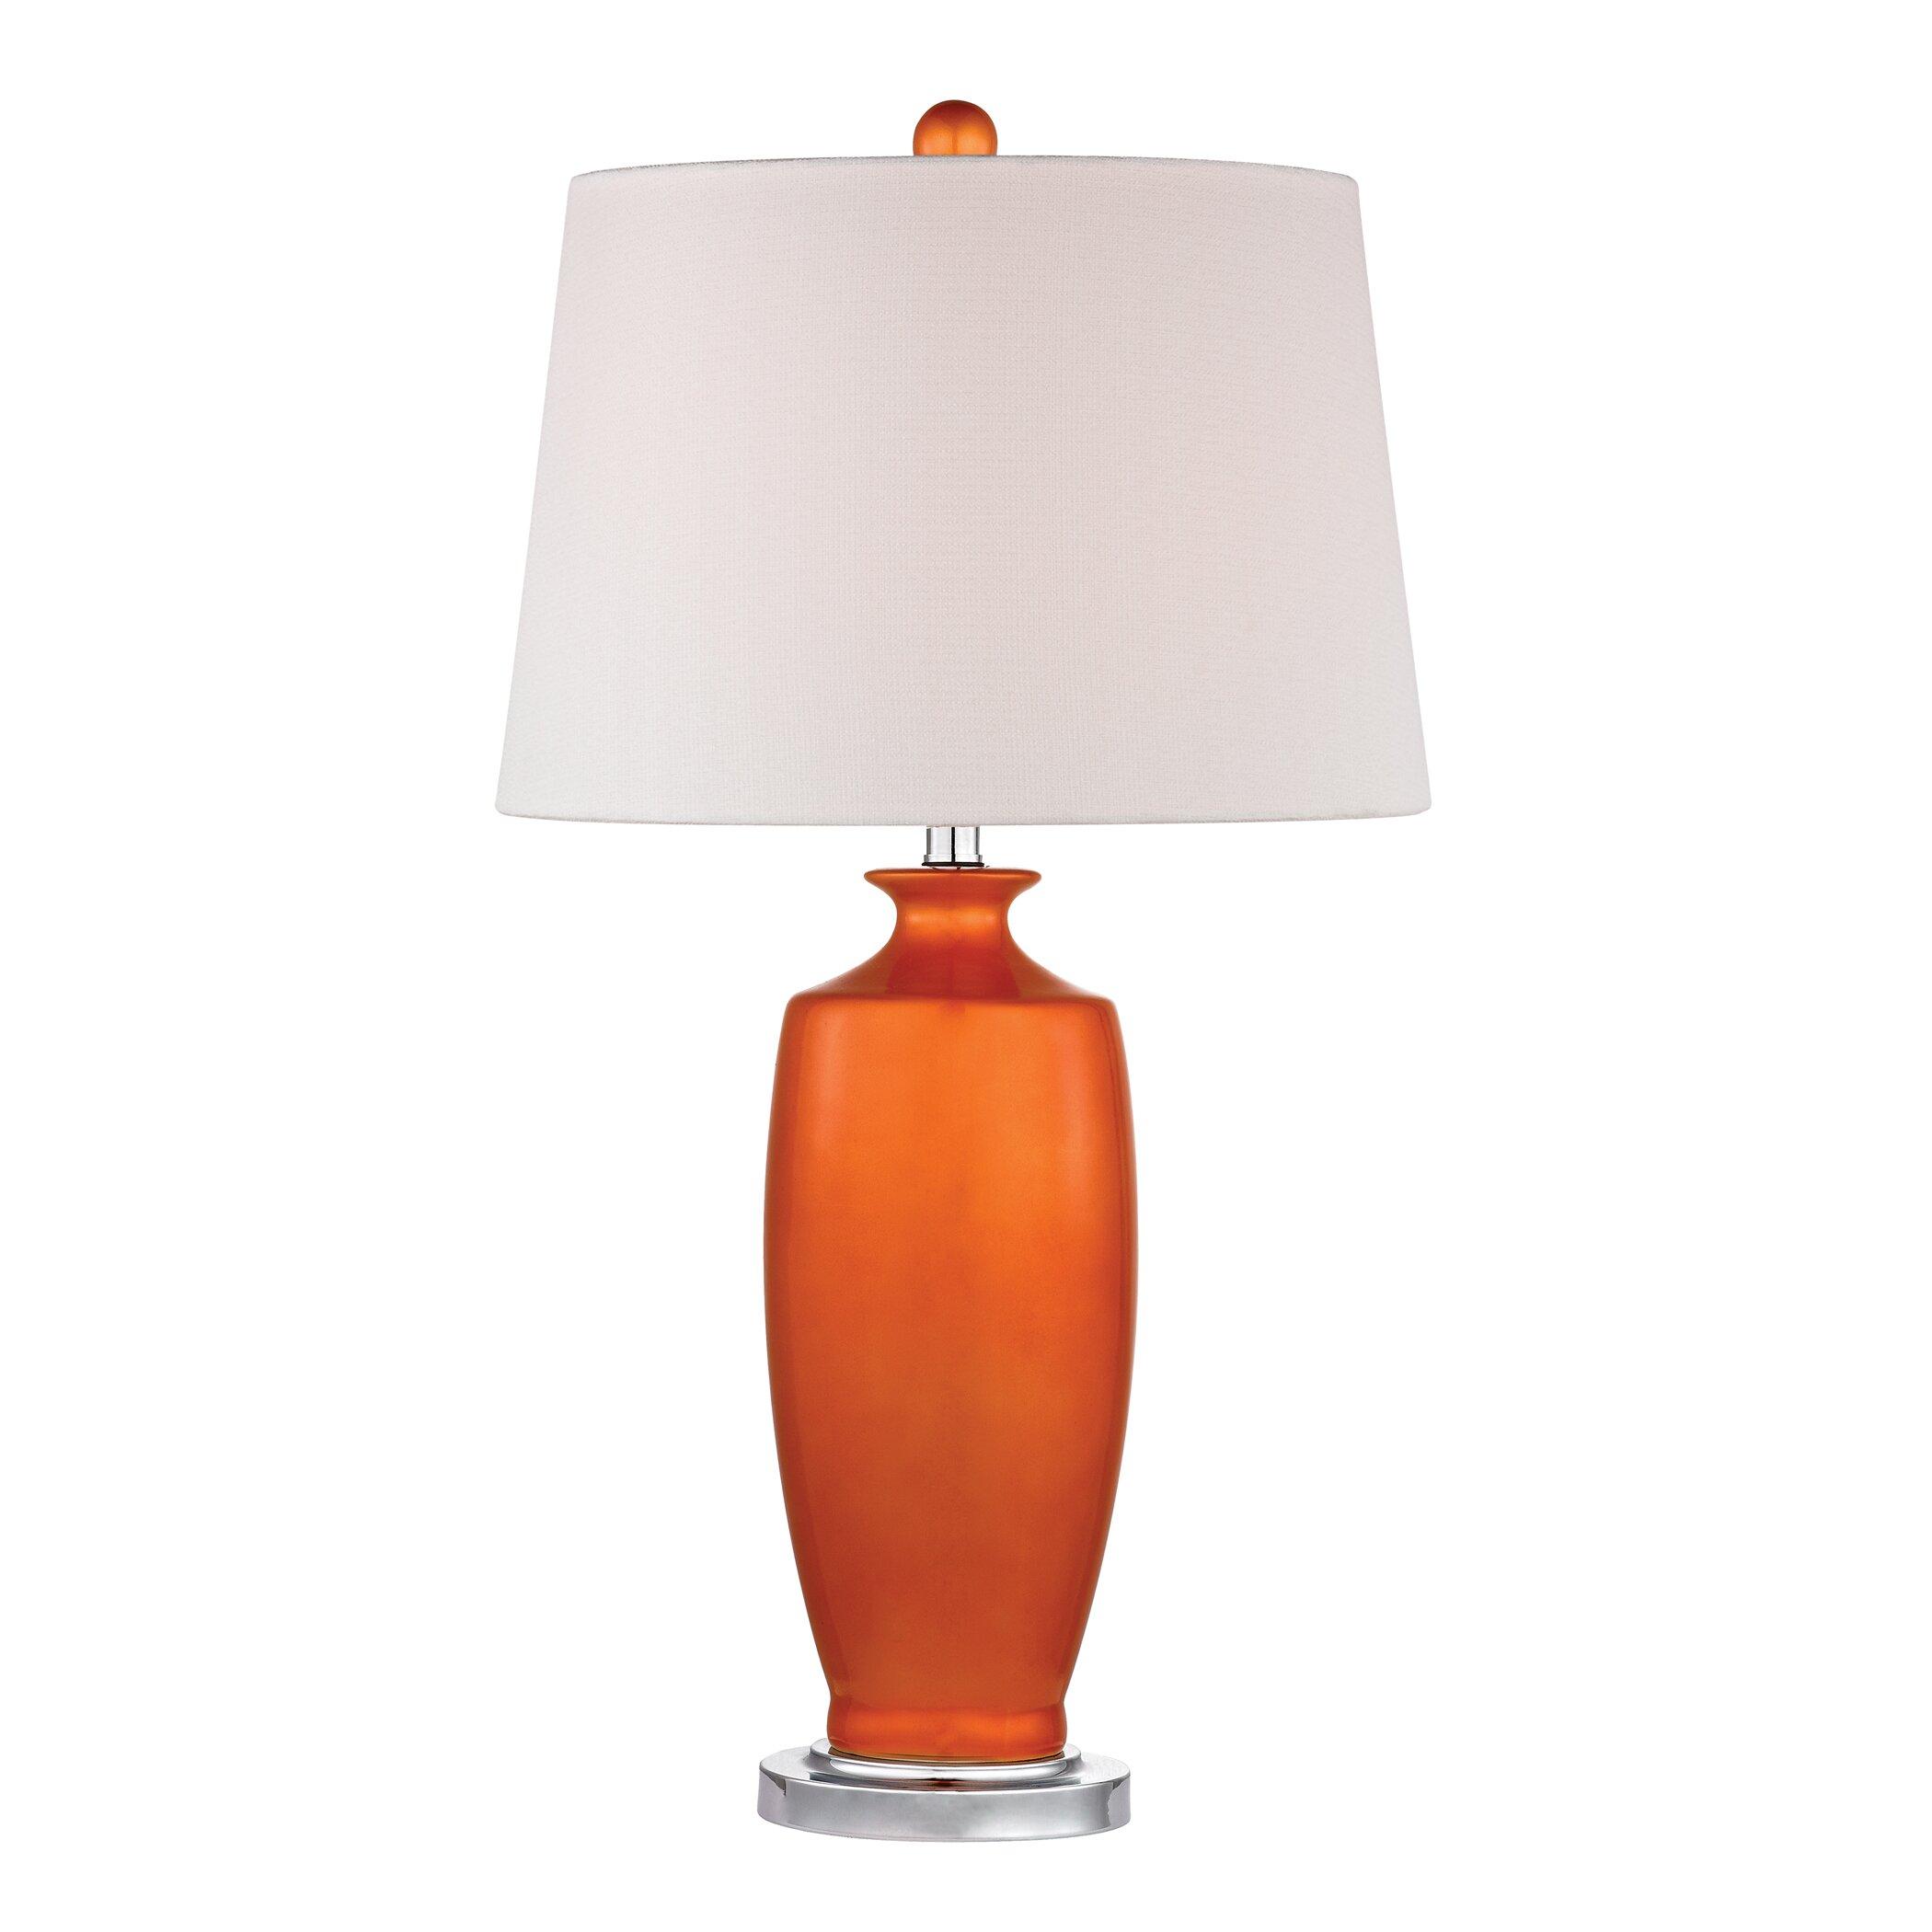 dimond lighting 27 table lamp reviews wayfair. Black Bedroom Furniture Sets. Home Design Ideas